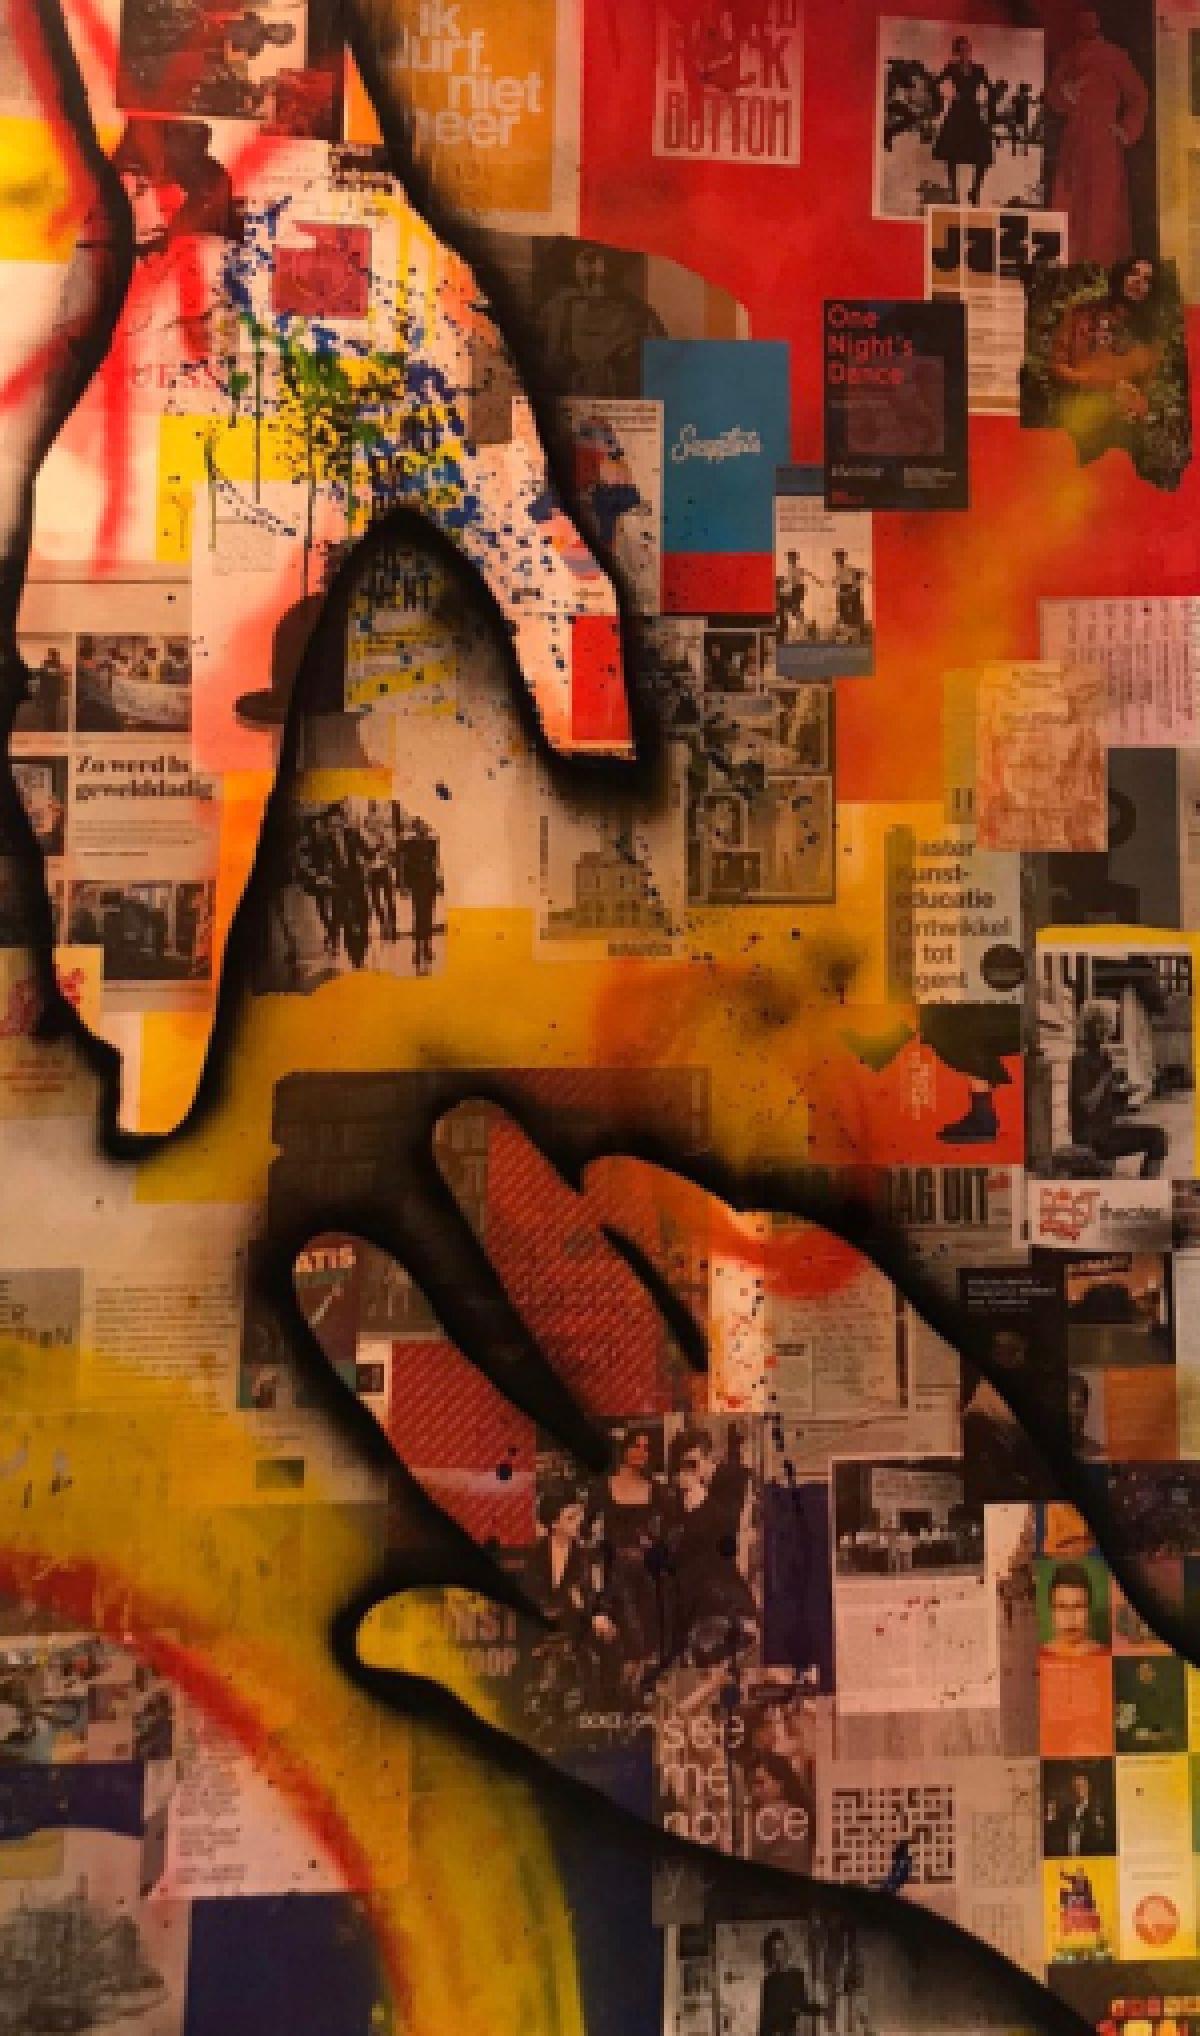 USG kunstexpositie